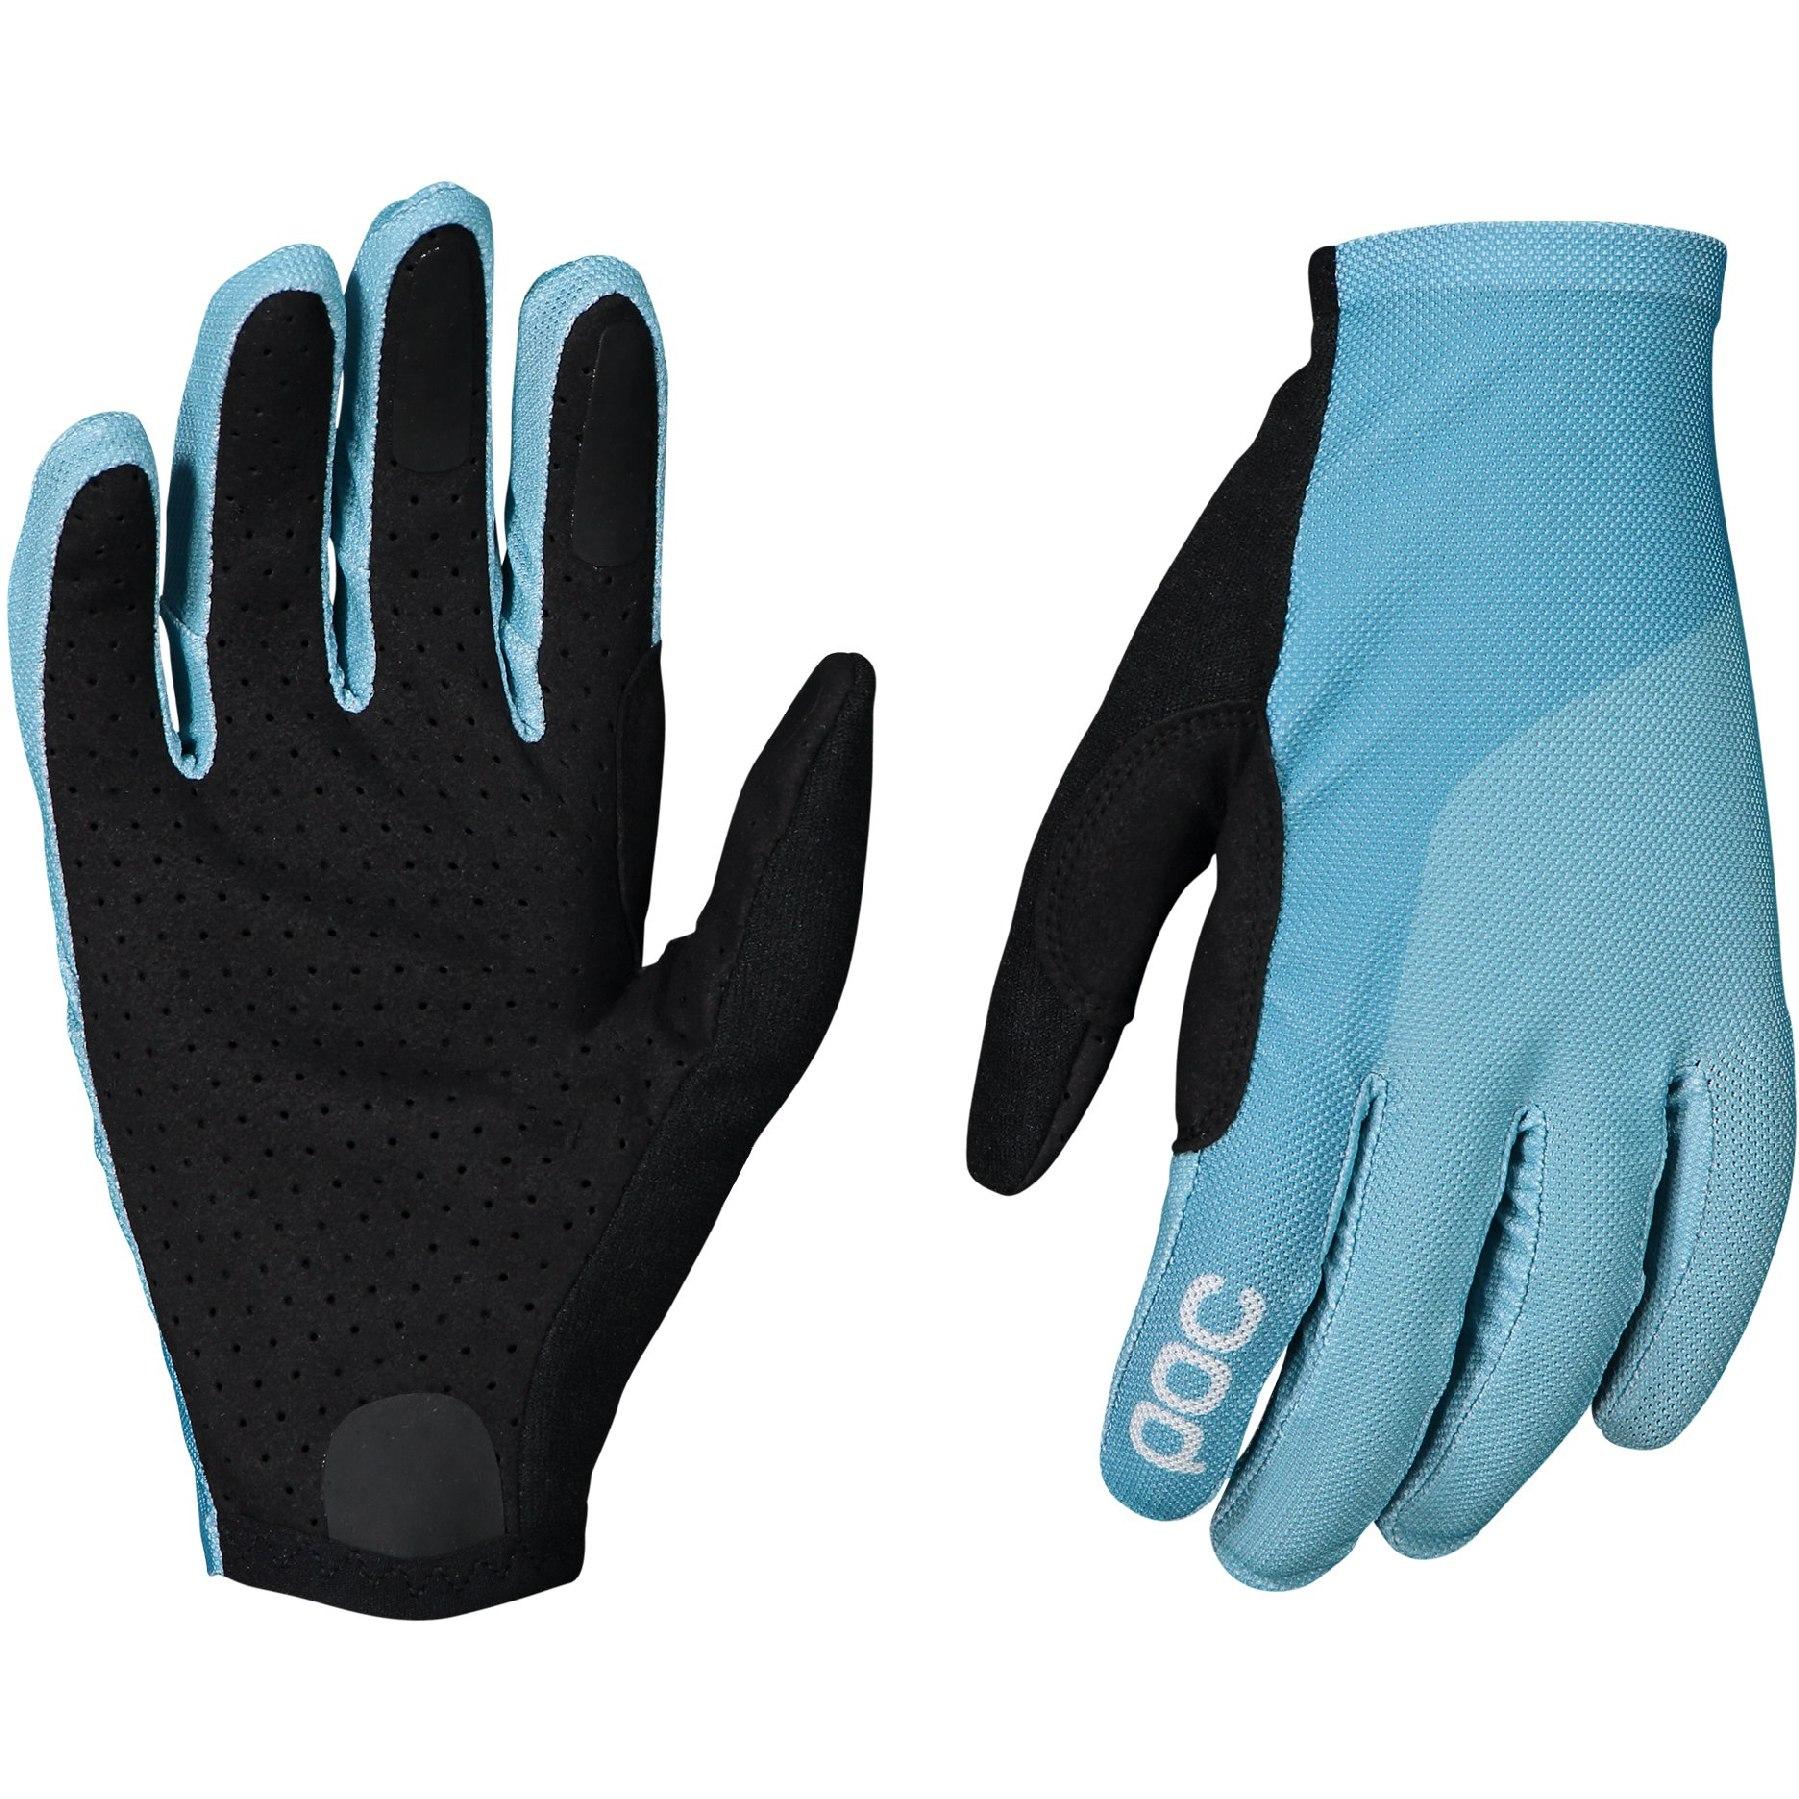 Foto de POC Essential Mesh Glove Guantes de ciclismo - 8310 Lt Basalt Blue/Basalt Blue